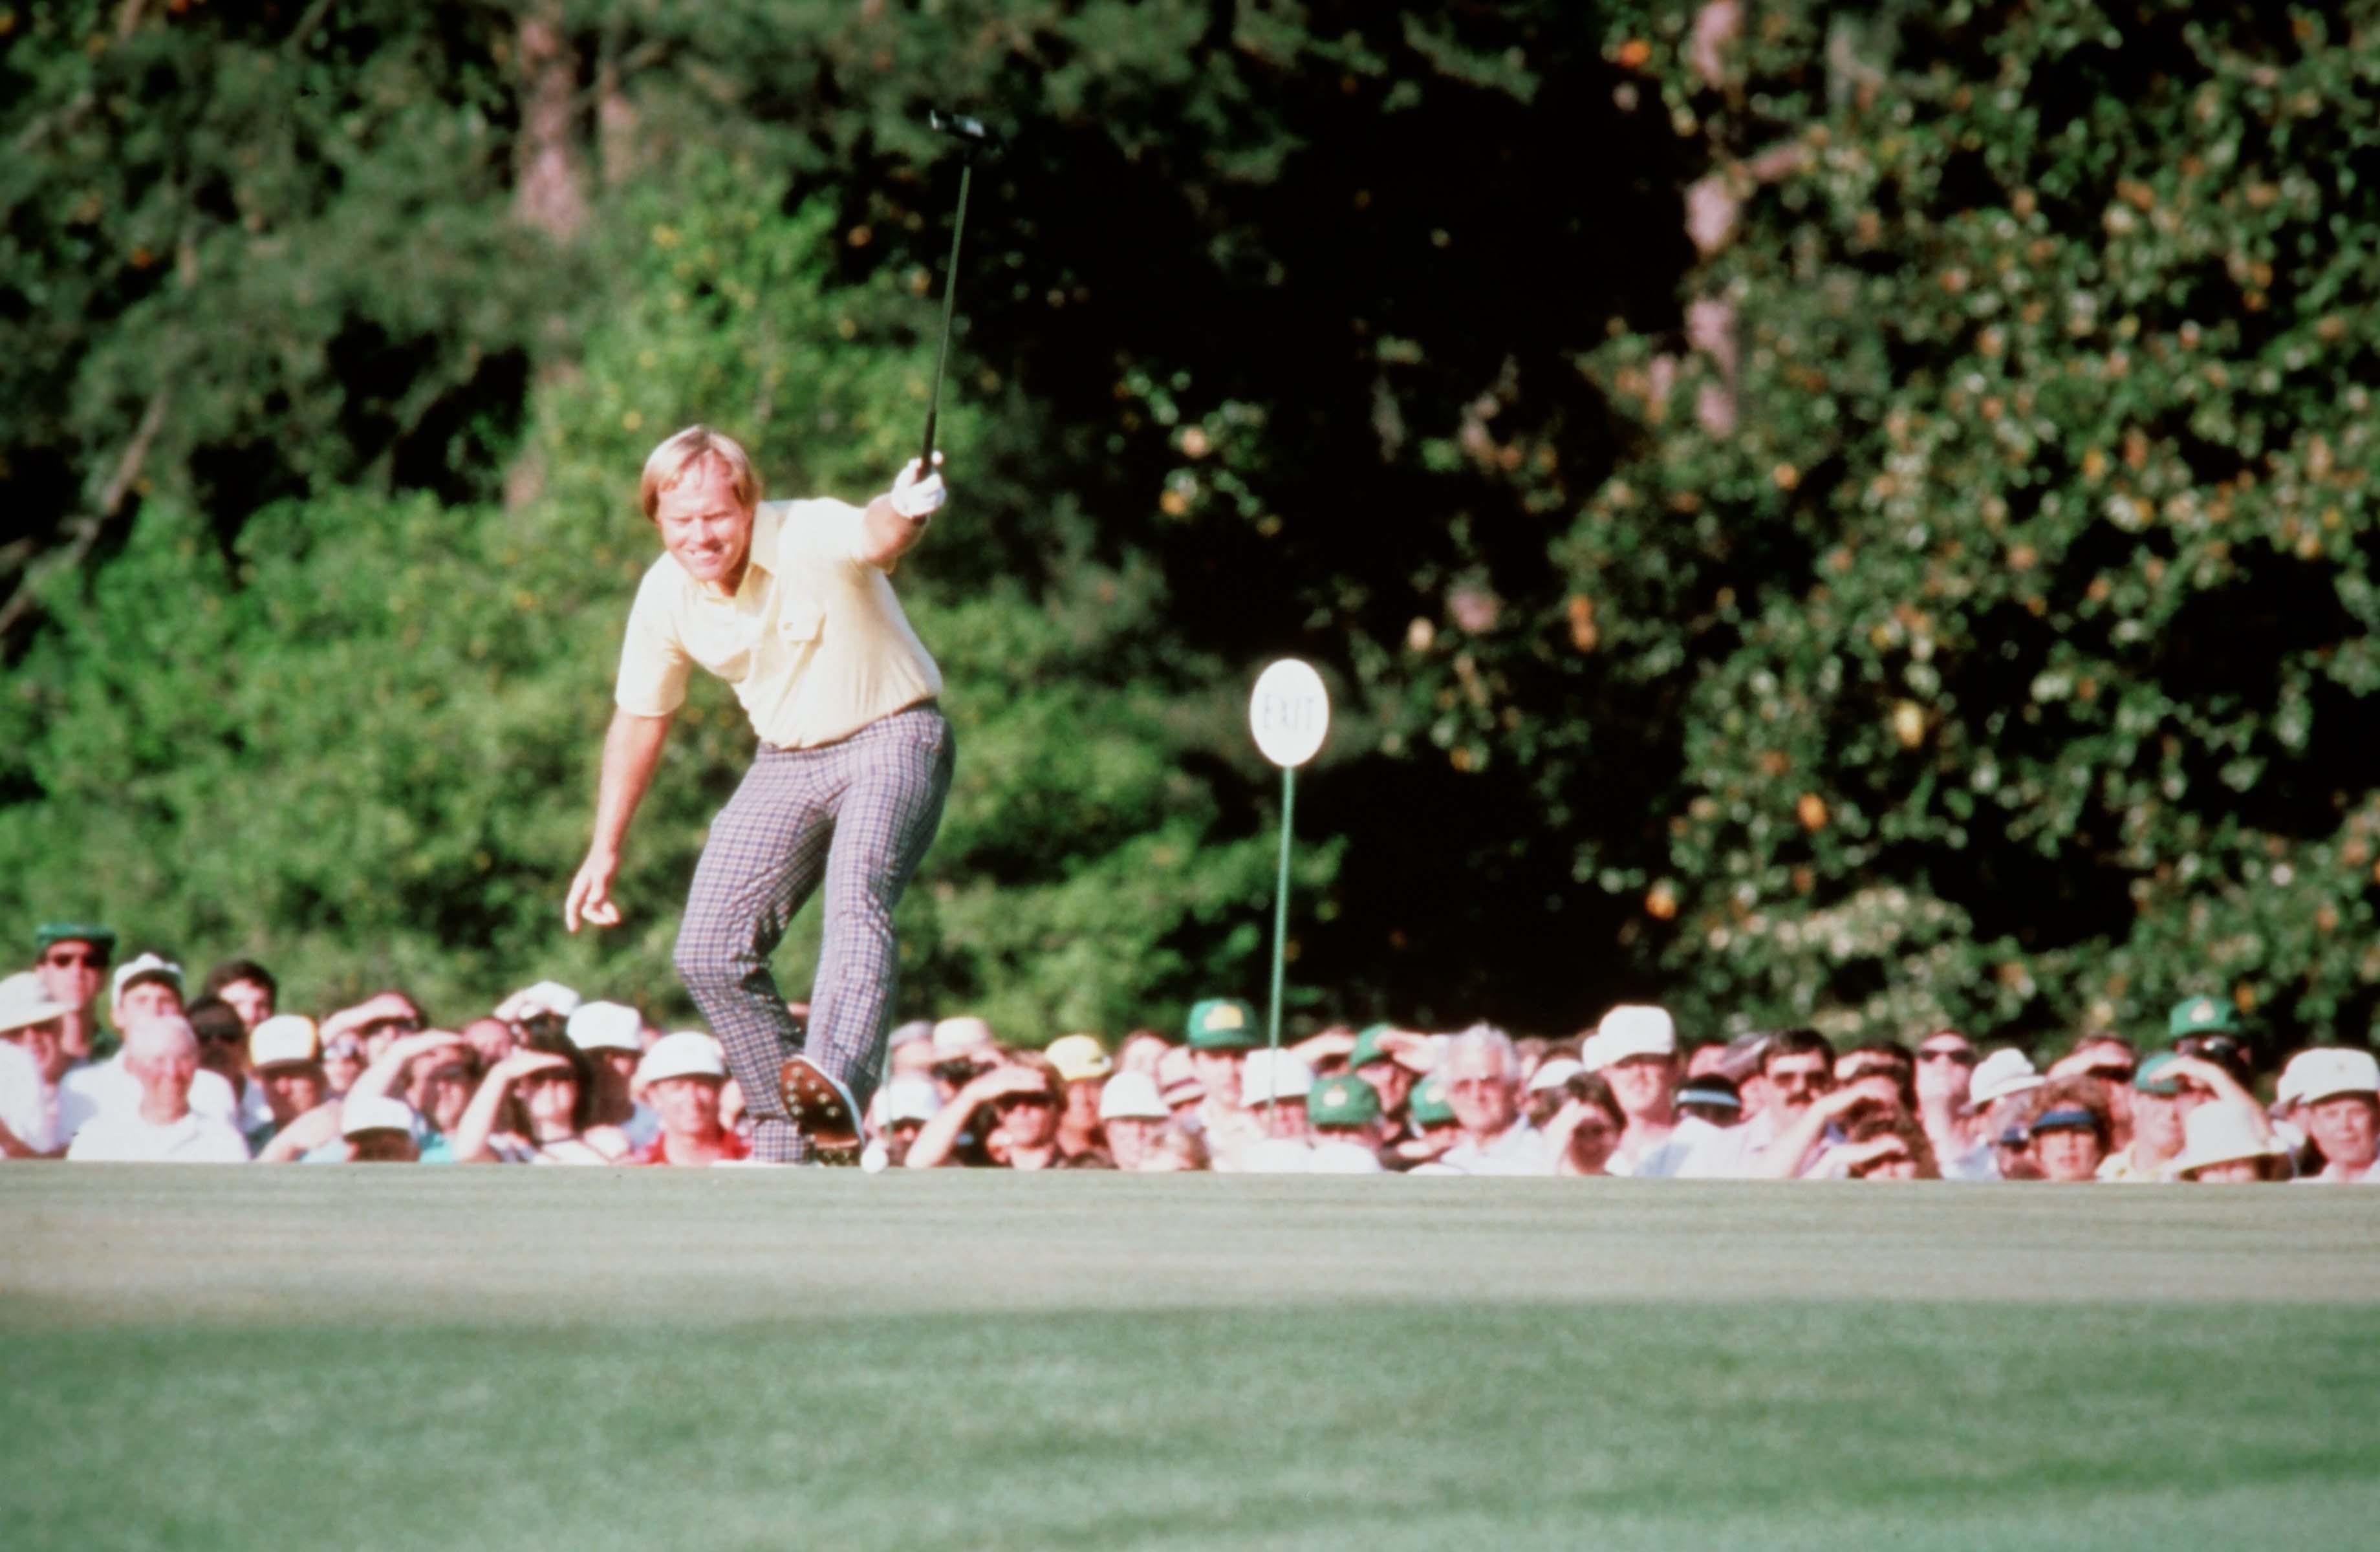 nicklaus jack masters 1986 sir yes golf getty pga master